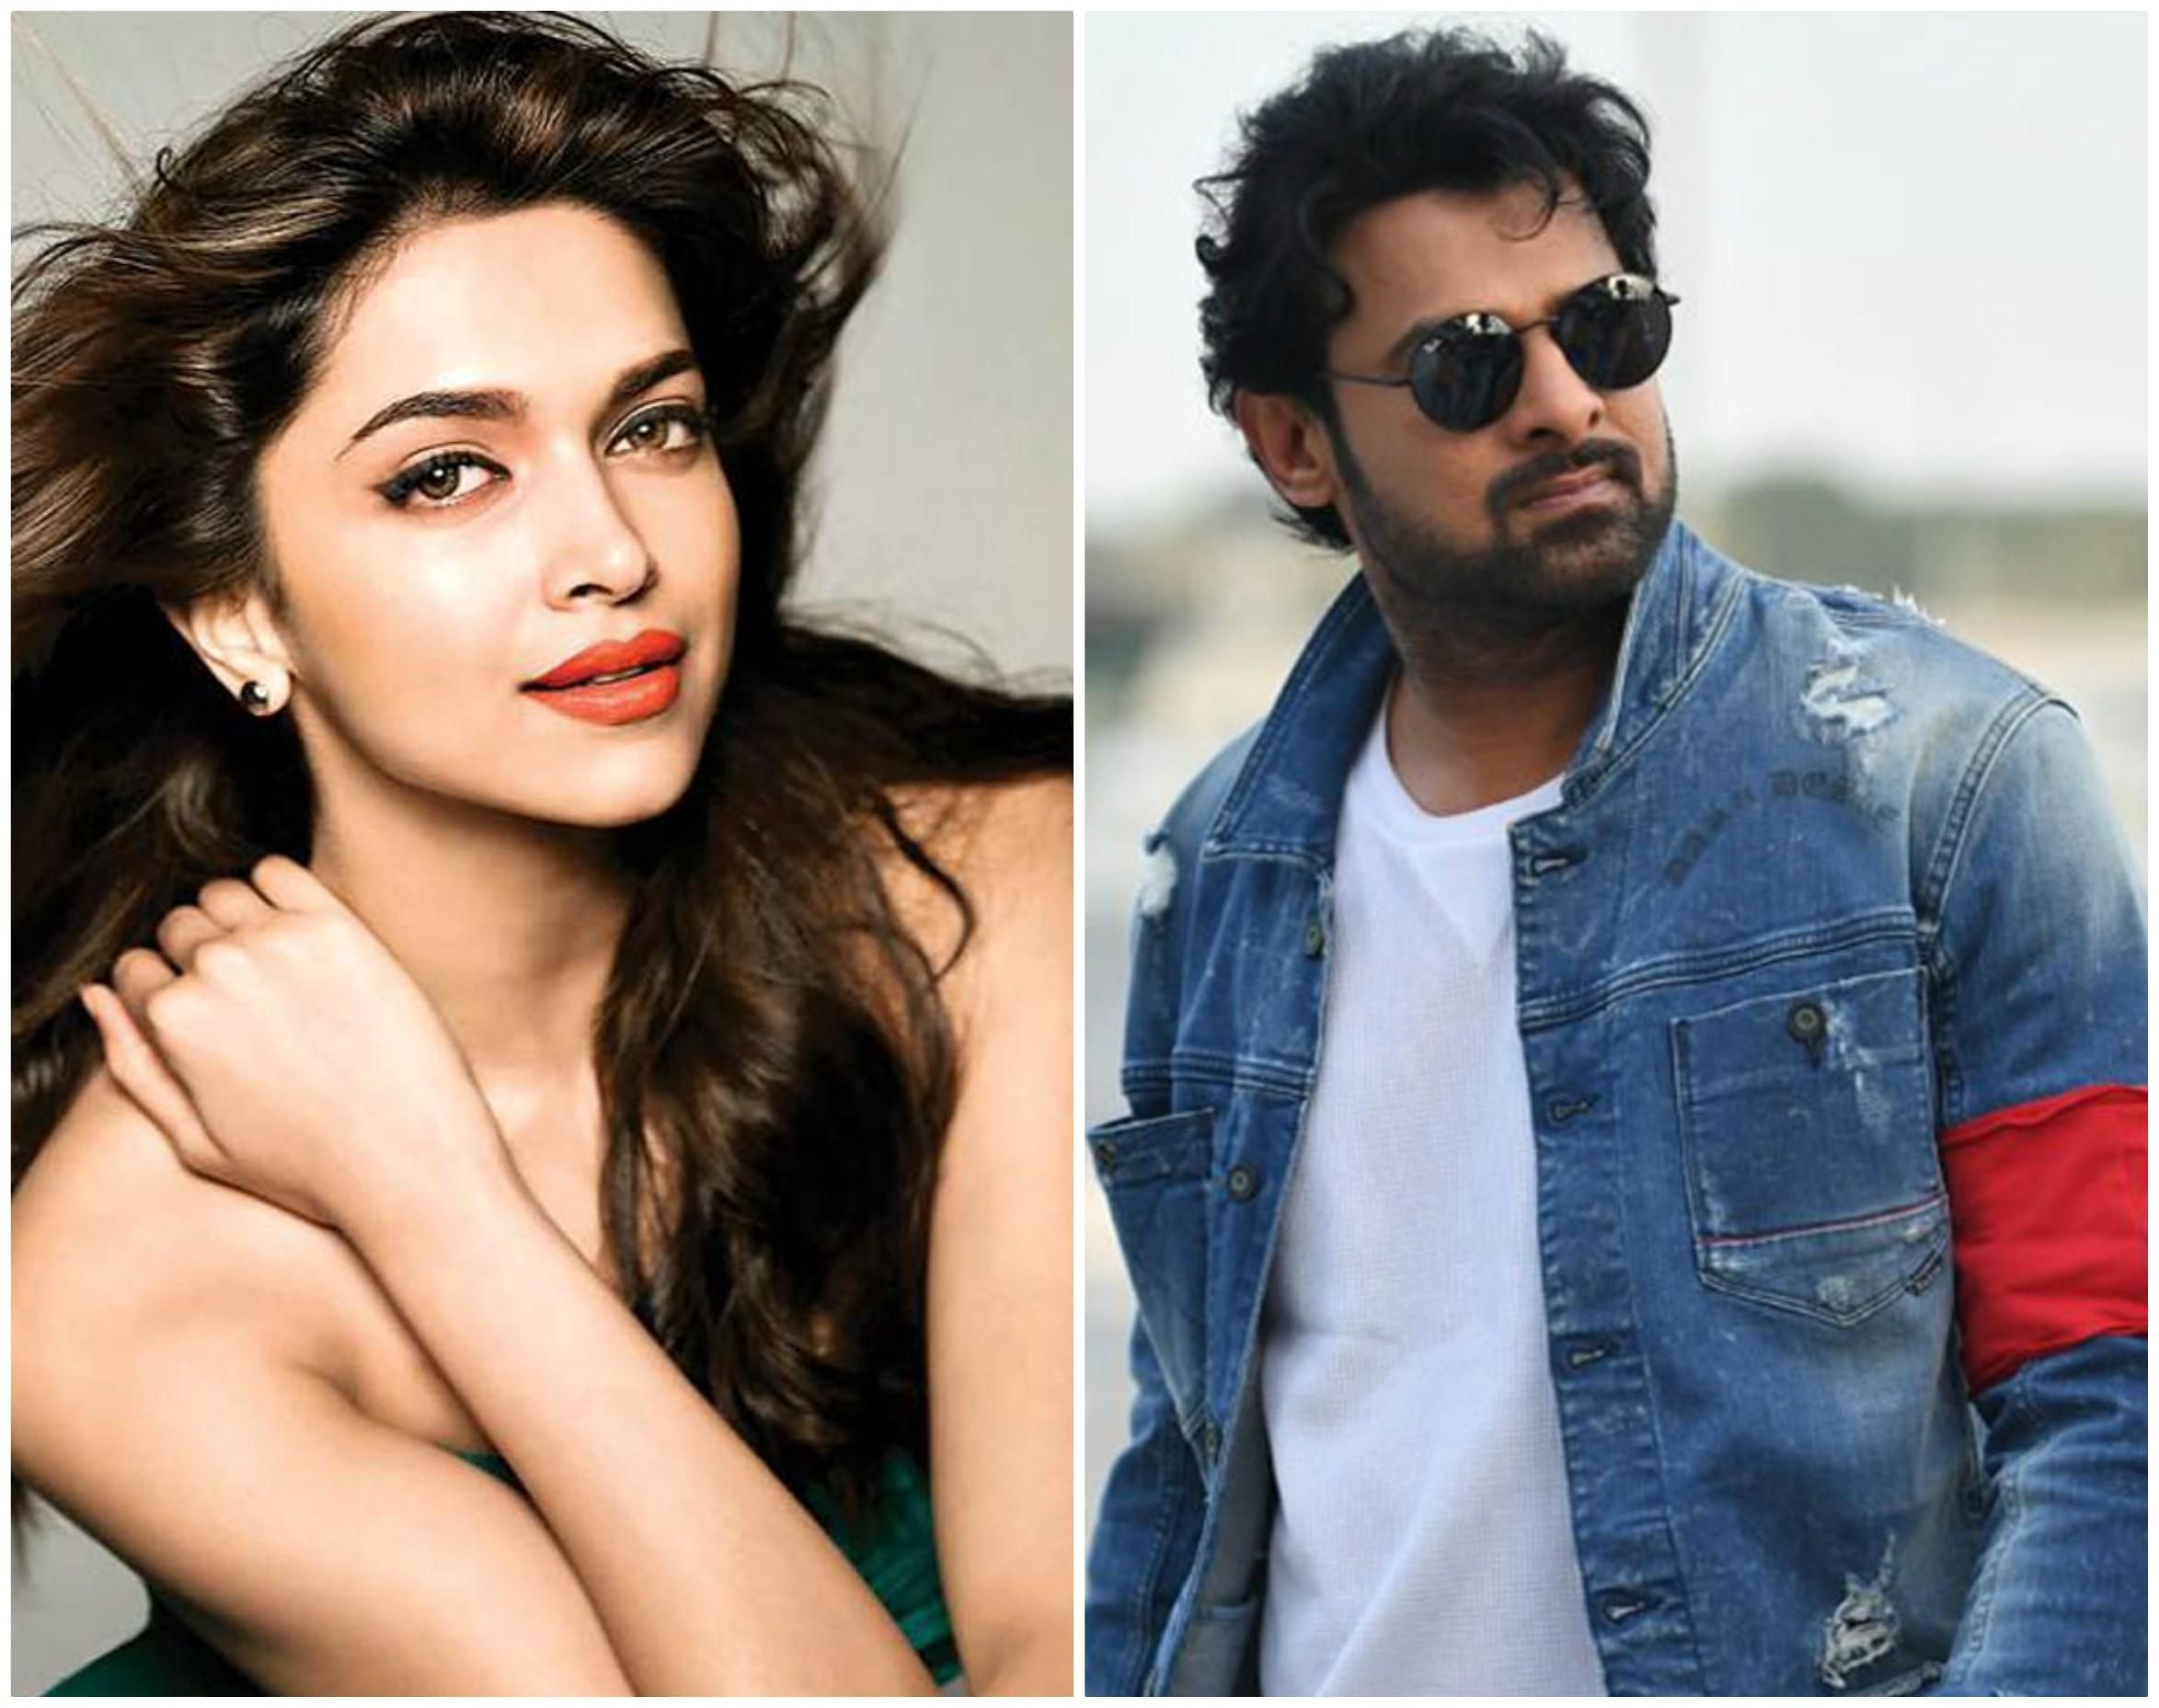 deepika padukone to star opposite prabhas in upcoming sci fi film